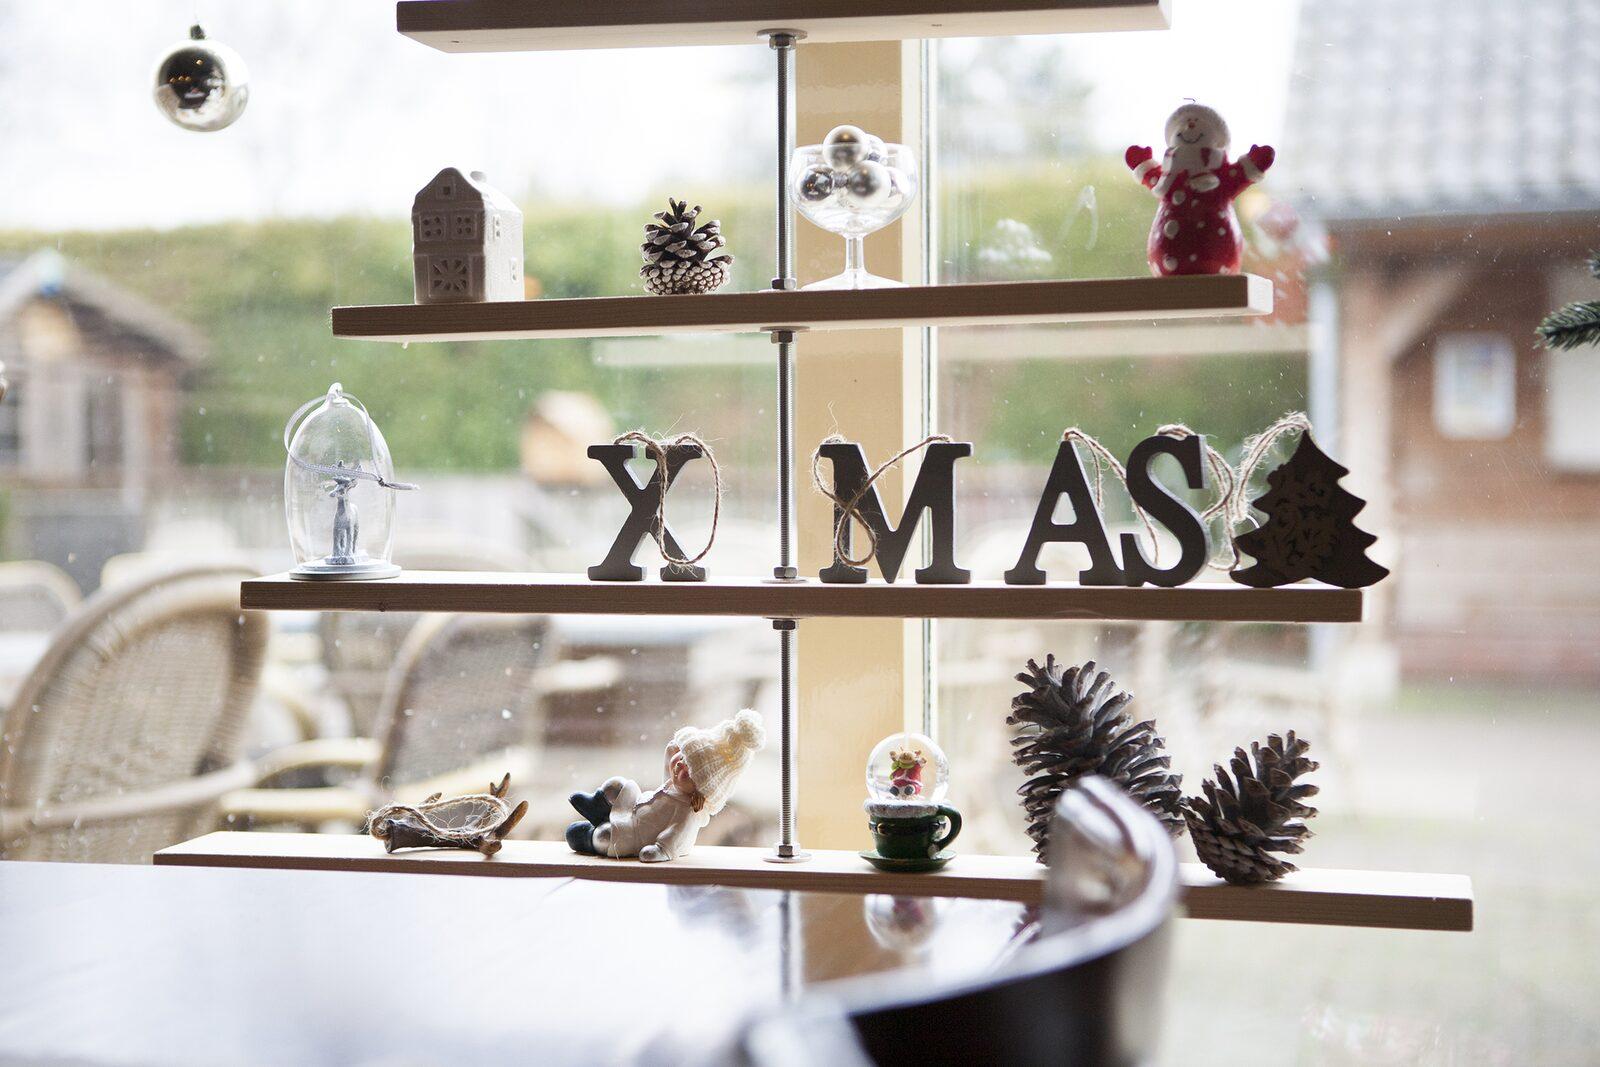 Weihnachtswochenendrabatt